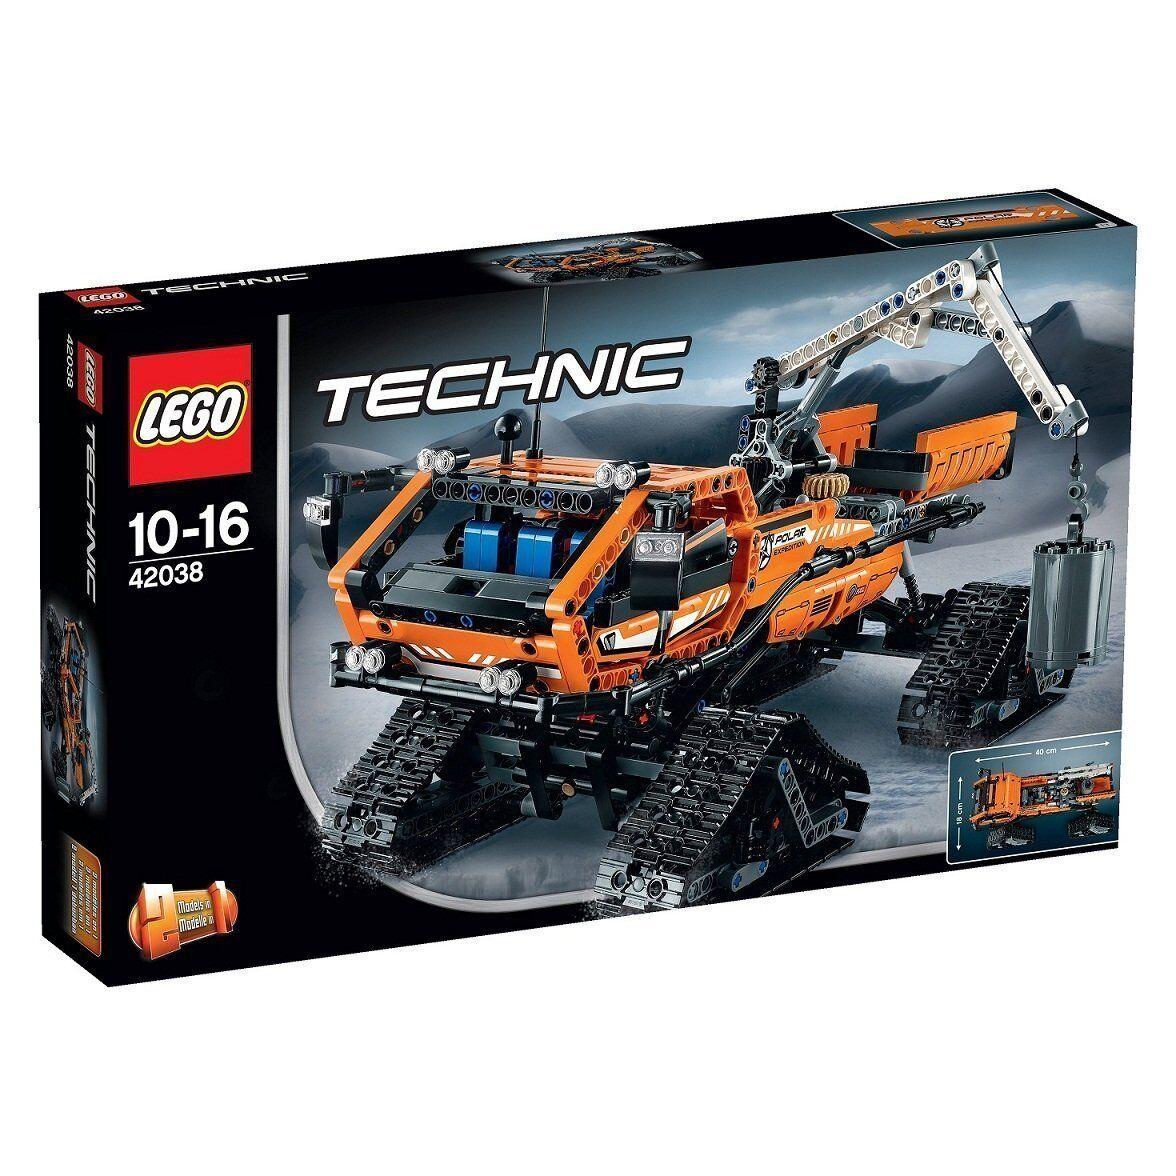 Lego Technic™ 42038 42038 42038 Véhicule à Chenilles Arctique Neuf Emballage D'Origine Misb 14deb7